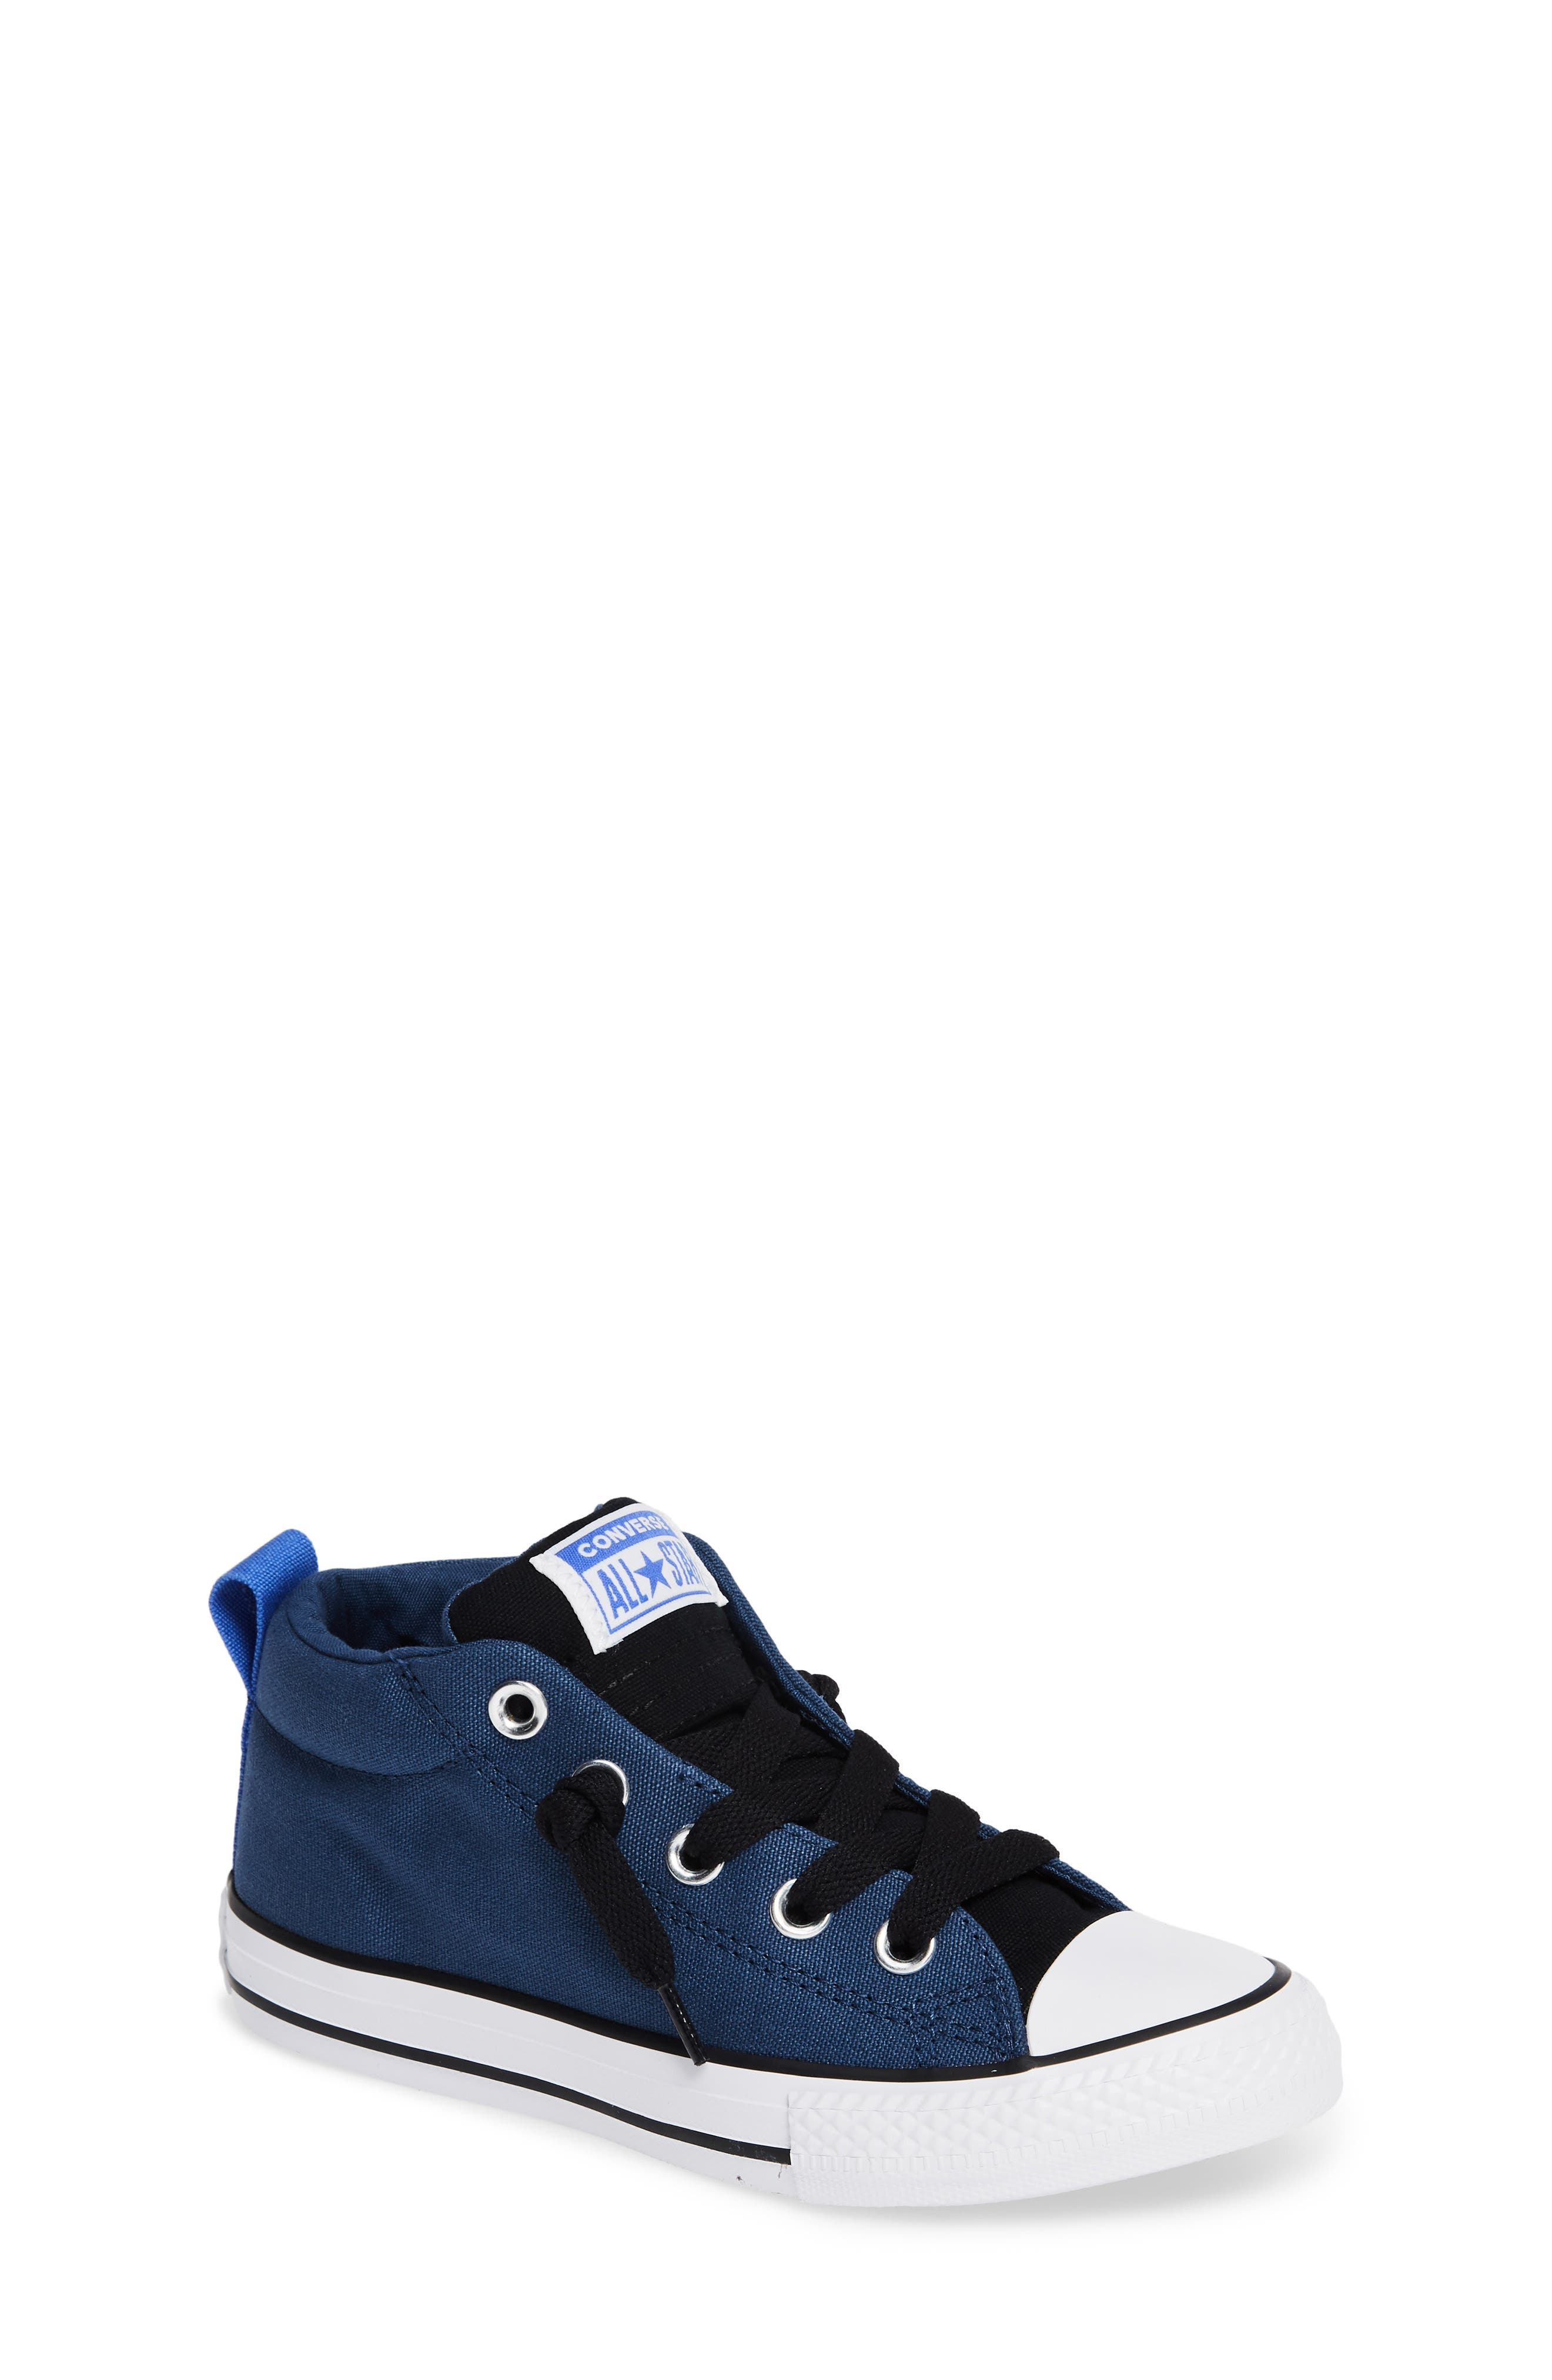 CONVERSE,                             Chuck Taylor<sup>®</sup> All Star<sup>®</sup> Seasonal Street Sneaker,                             Main thumbnail 1, color,                             403